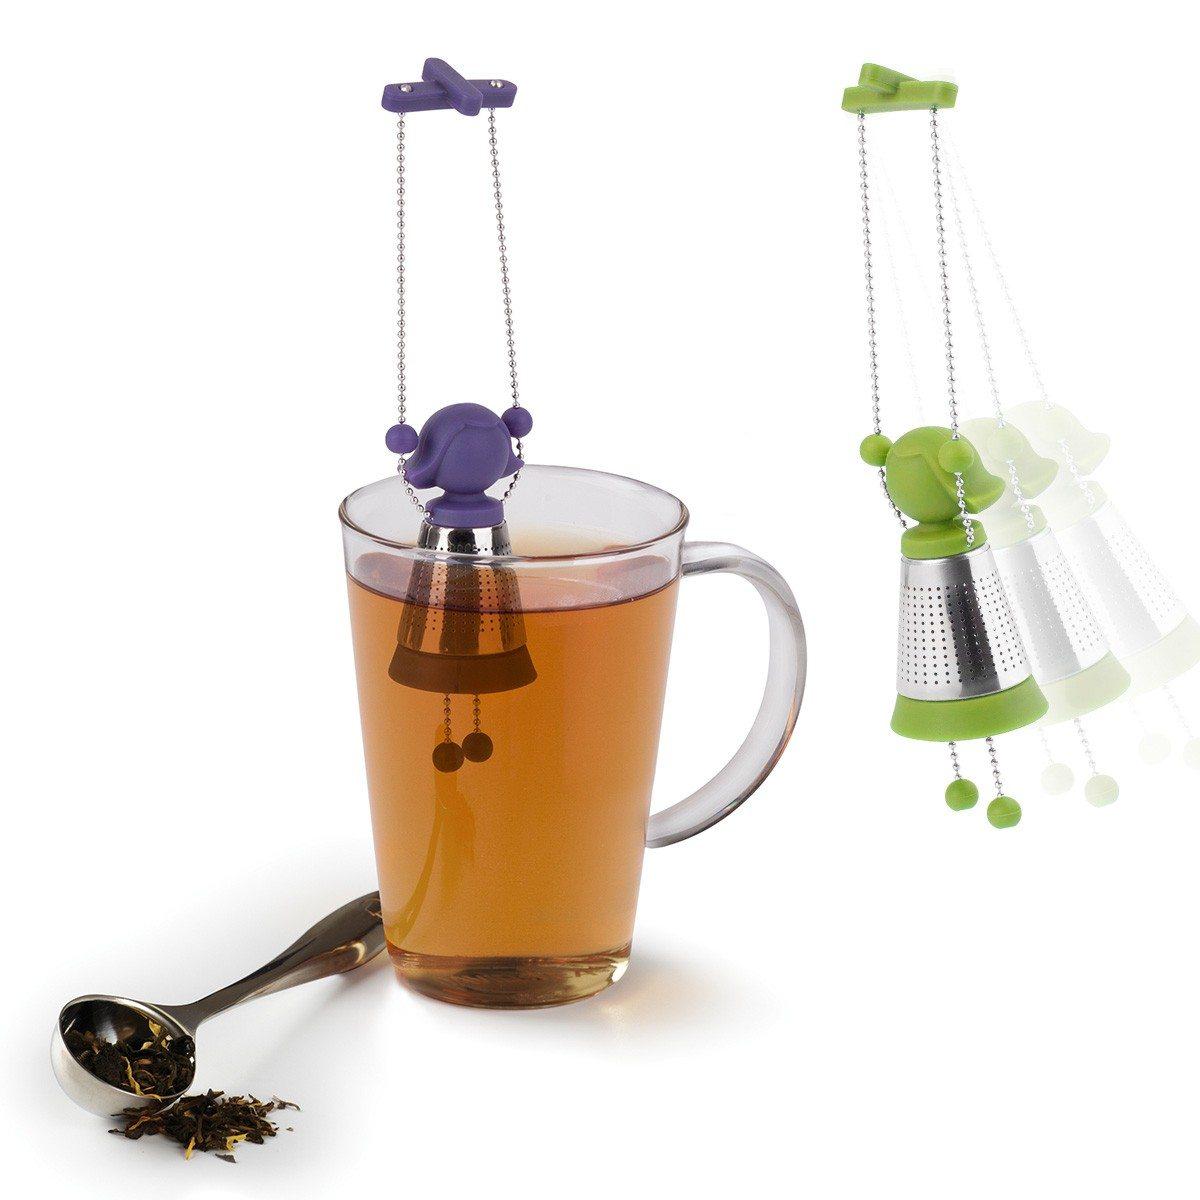 Tee-Marionette